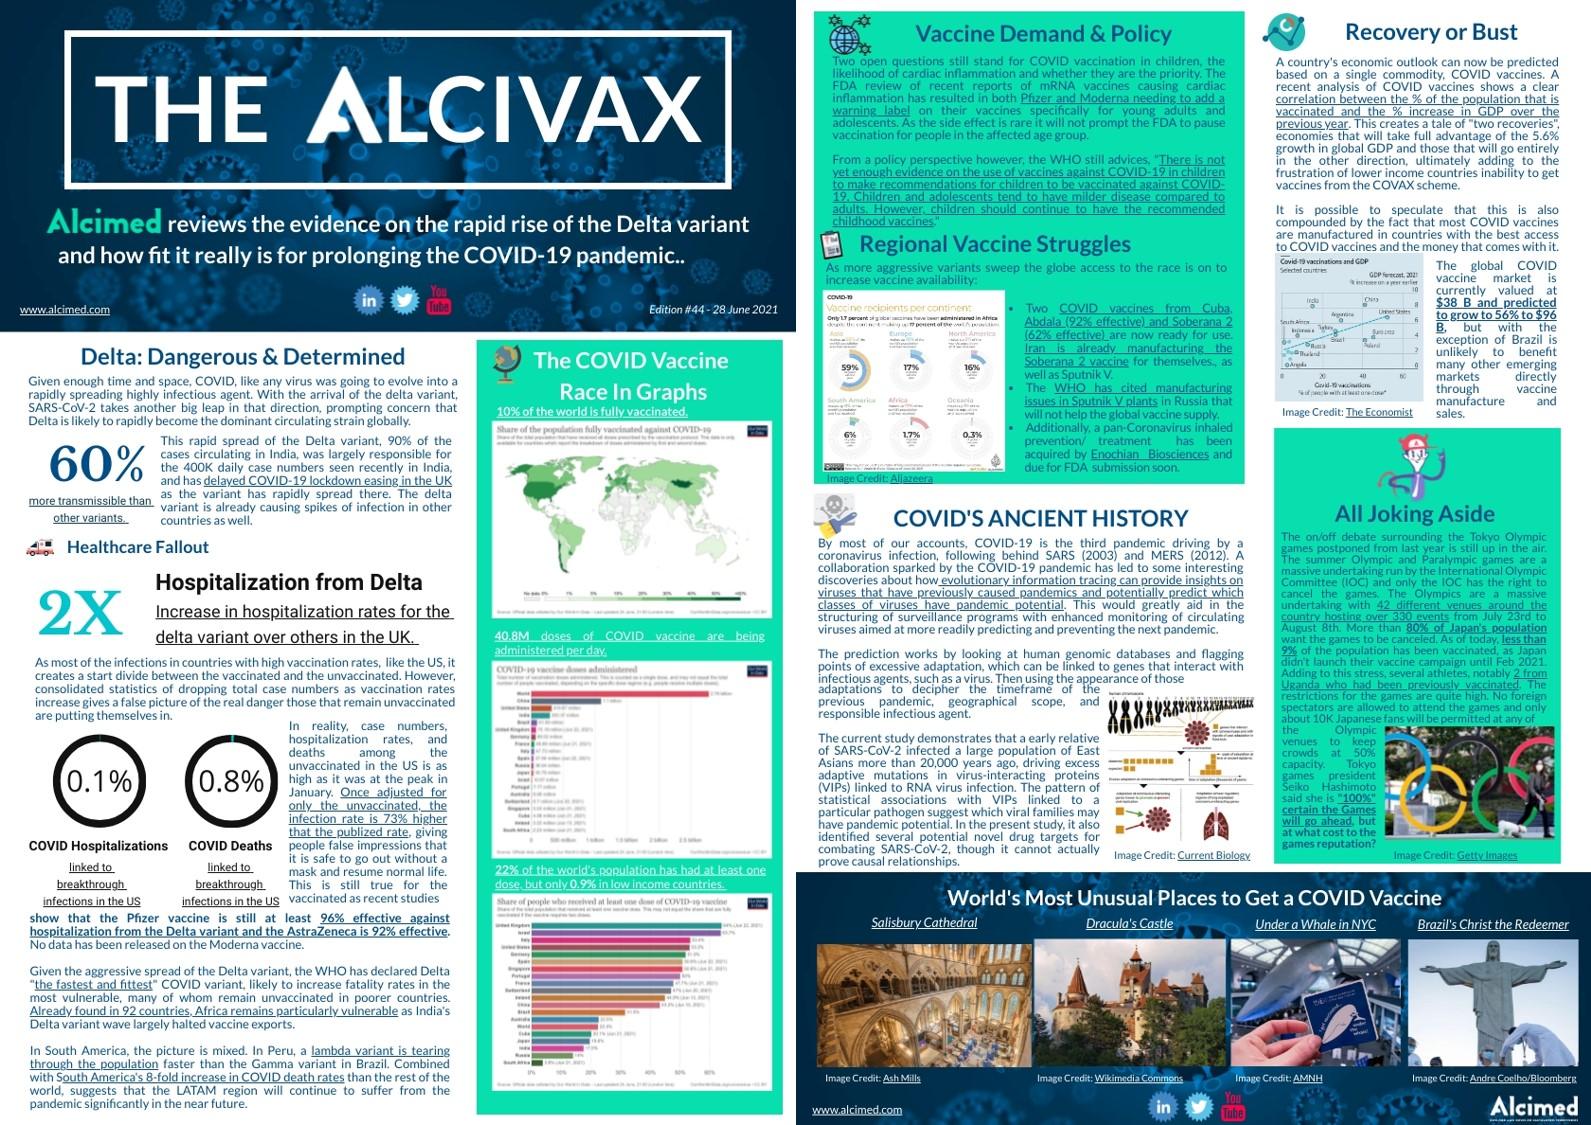 Alcivax#44-logbook-article-Alcimed-covid19-coronavirus